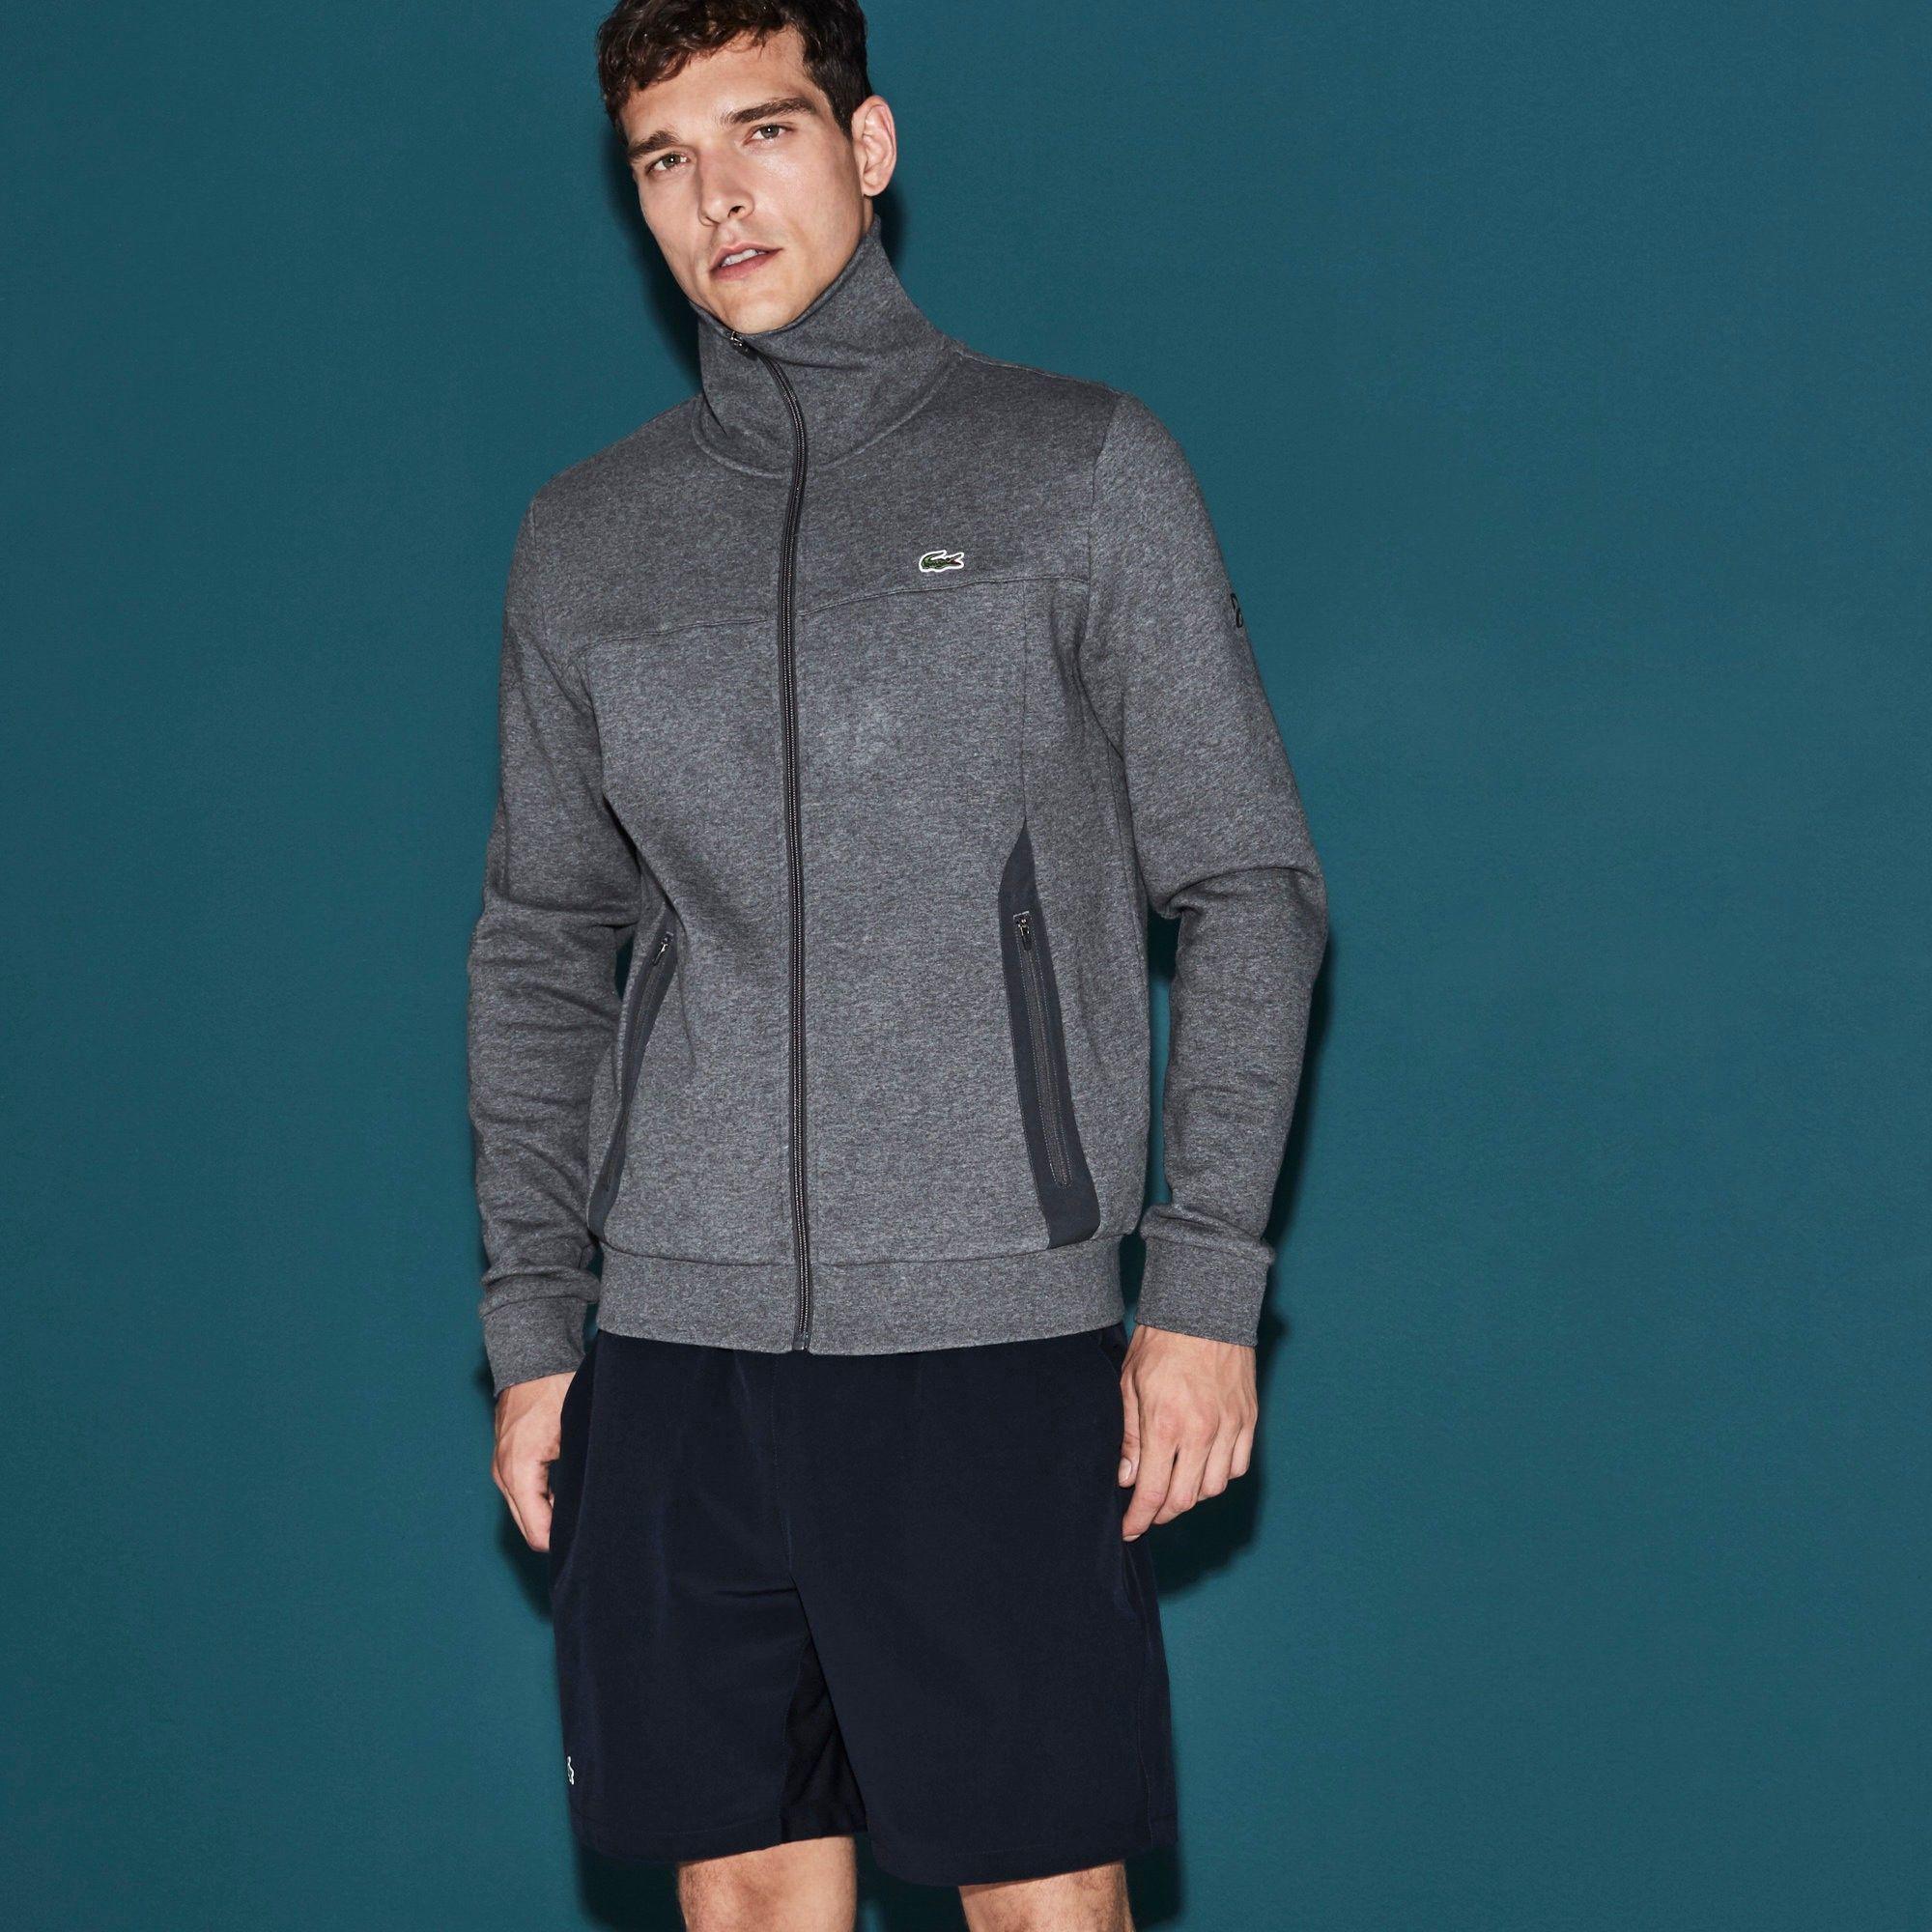 3126268728 LACOSTE Men's SPORT Tennis Zippered Fleece Sweatshirt - Novak Djokovic  Supporter Collection - pitch grey. #lacoste #cloth #